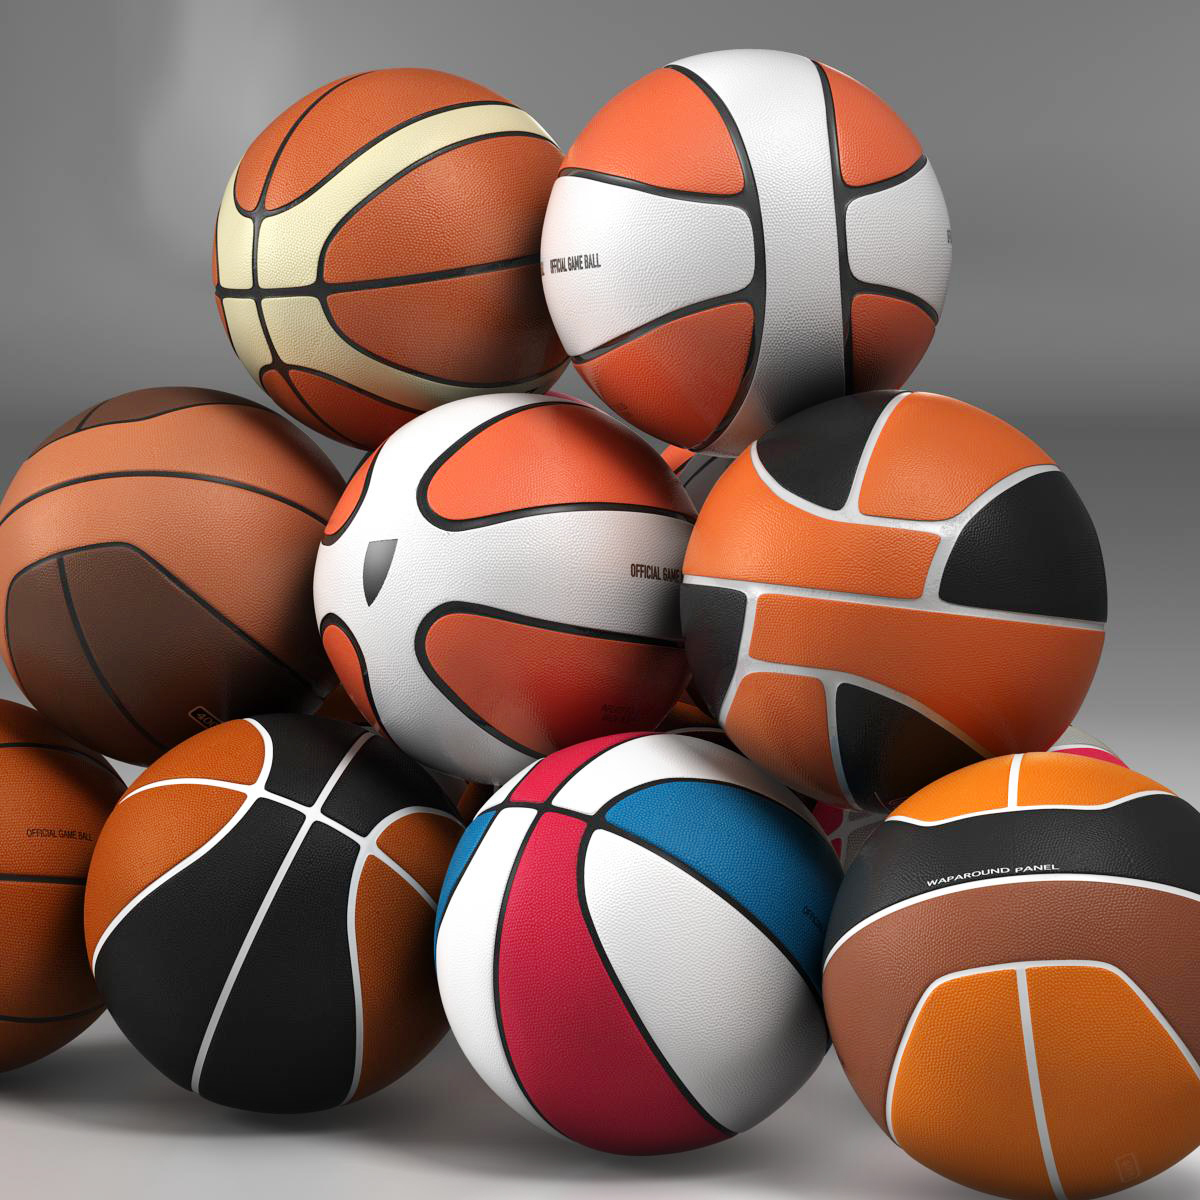 basketbola bumbu komplekts 3d modelis 3ds max fbx c4d ma mb obj 165929